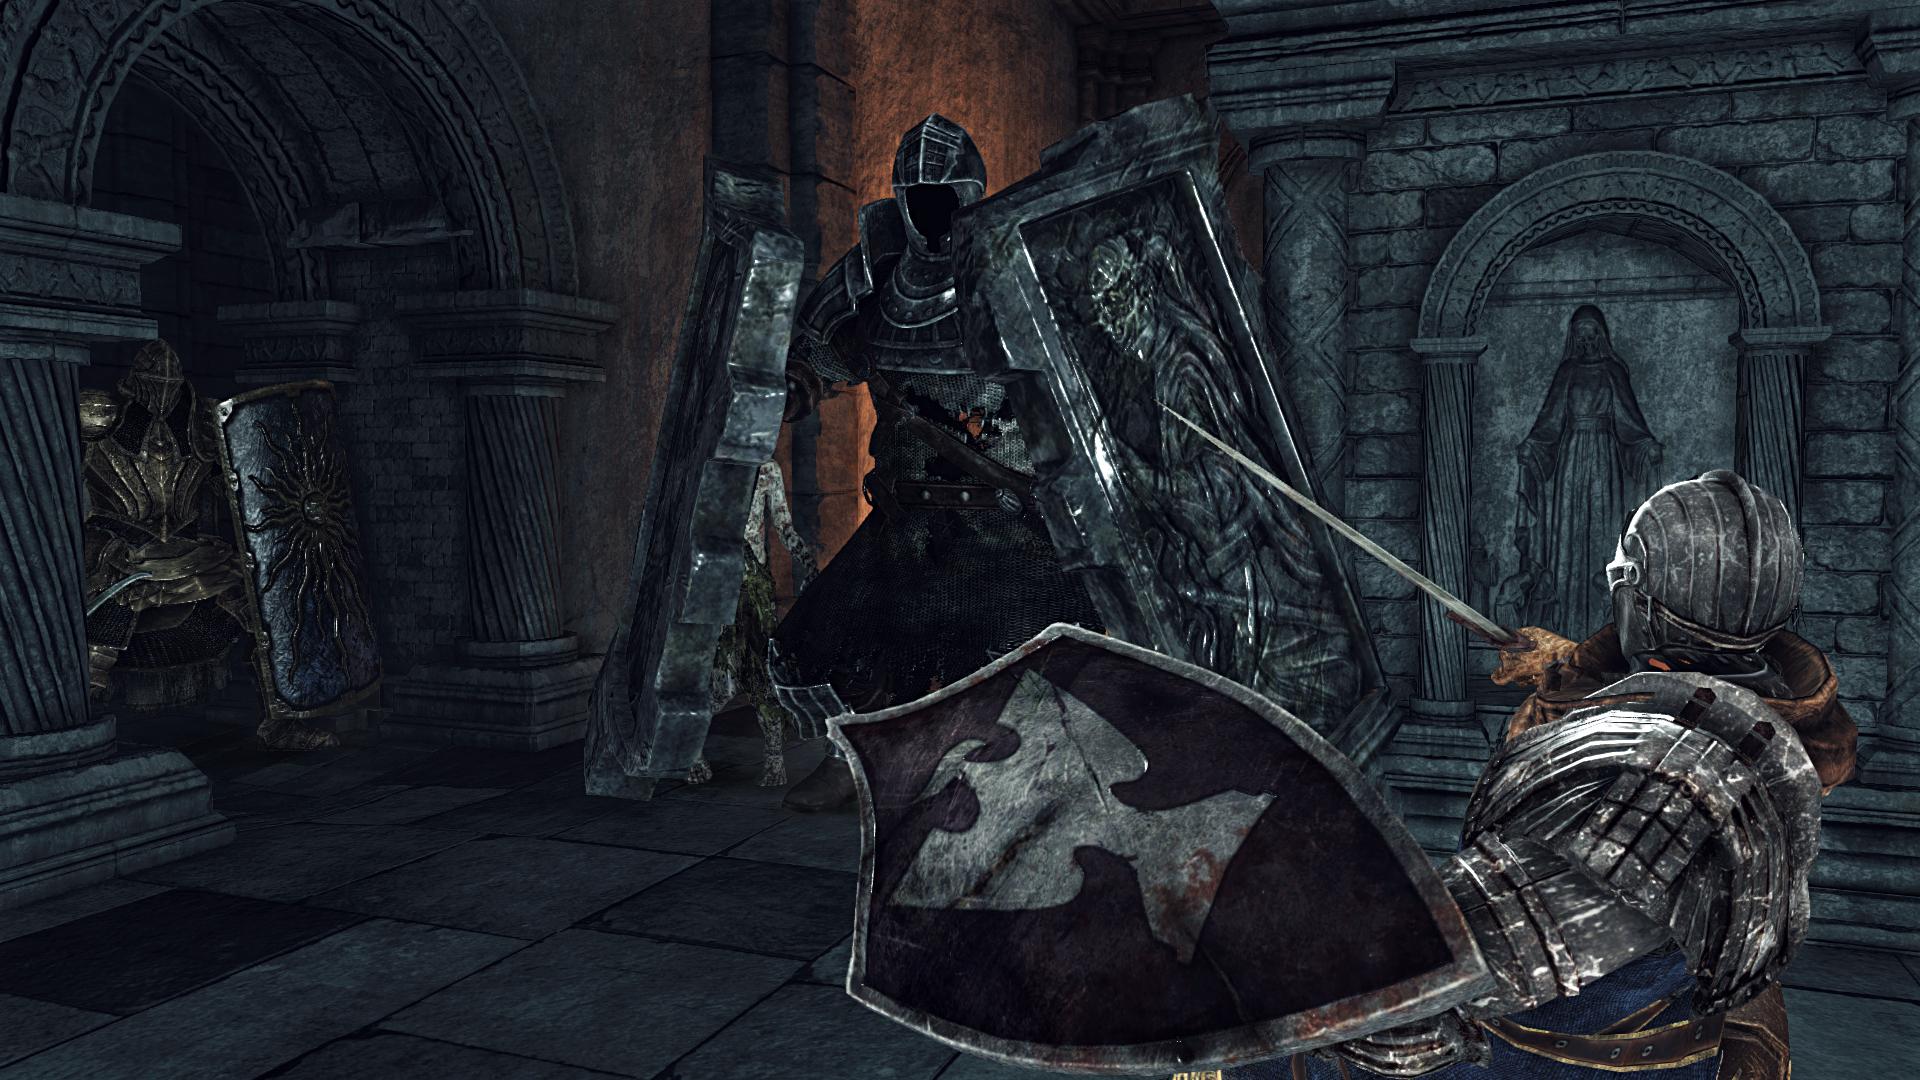 Obrazem: Temné dungeony, kostlivci a monstra z Dark Souls 2: Scholar of the First Sin 107571